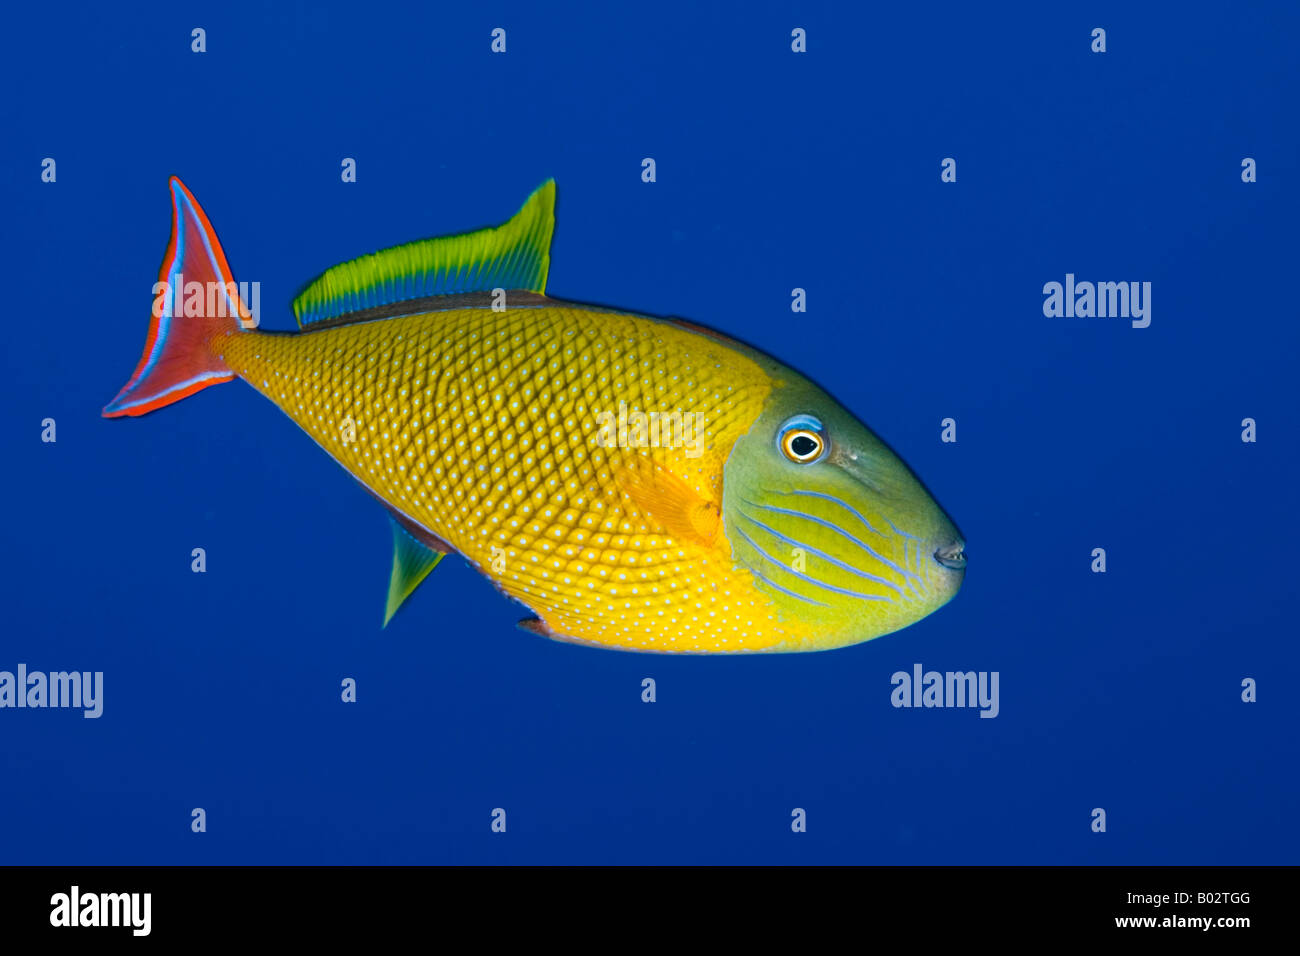 trigger fish in blue water, colorful, color, underwater, ocean, sea, scuba, diving, marine life, sea life, fish, - Stock Image